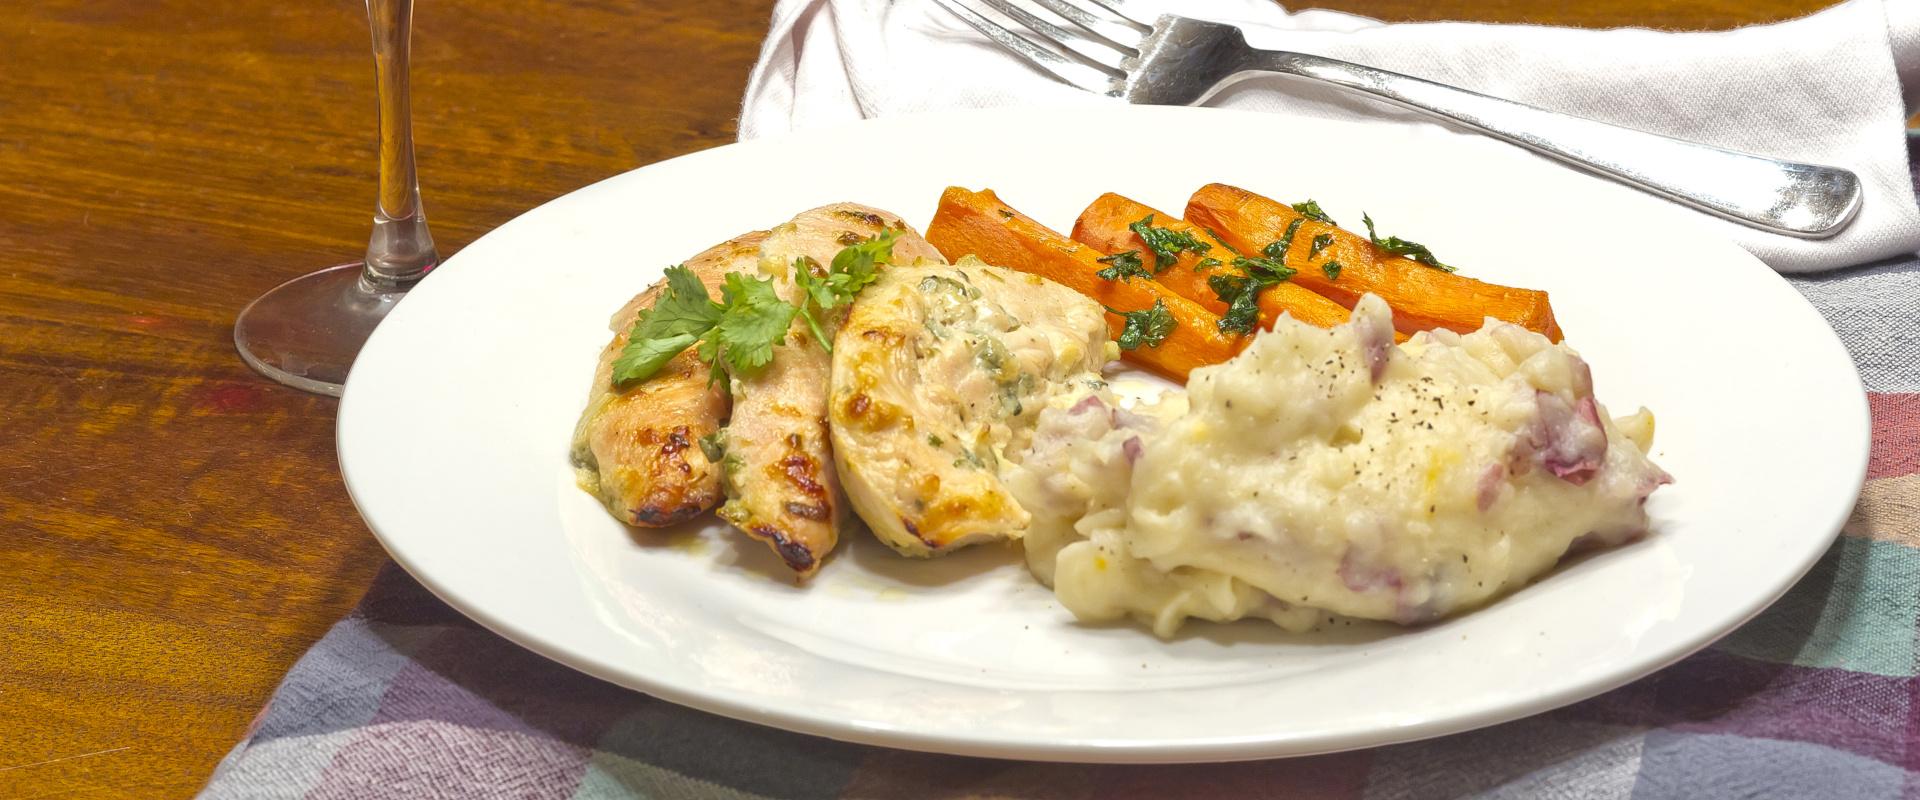 görög joghurtba pácolt csirke